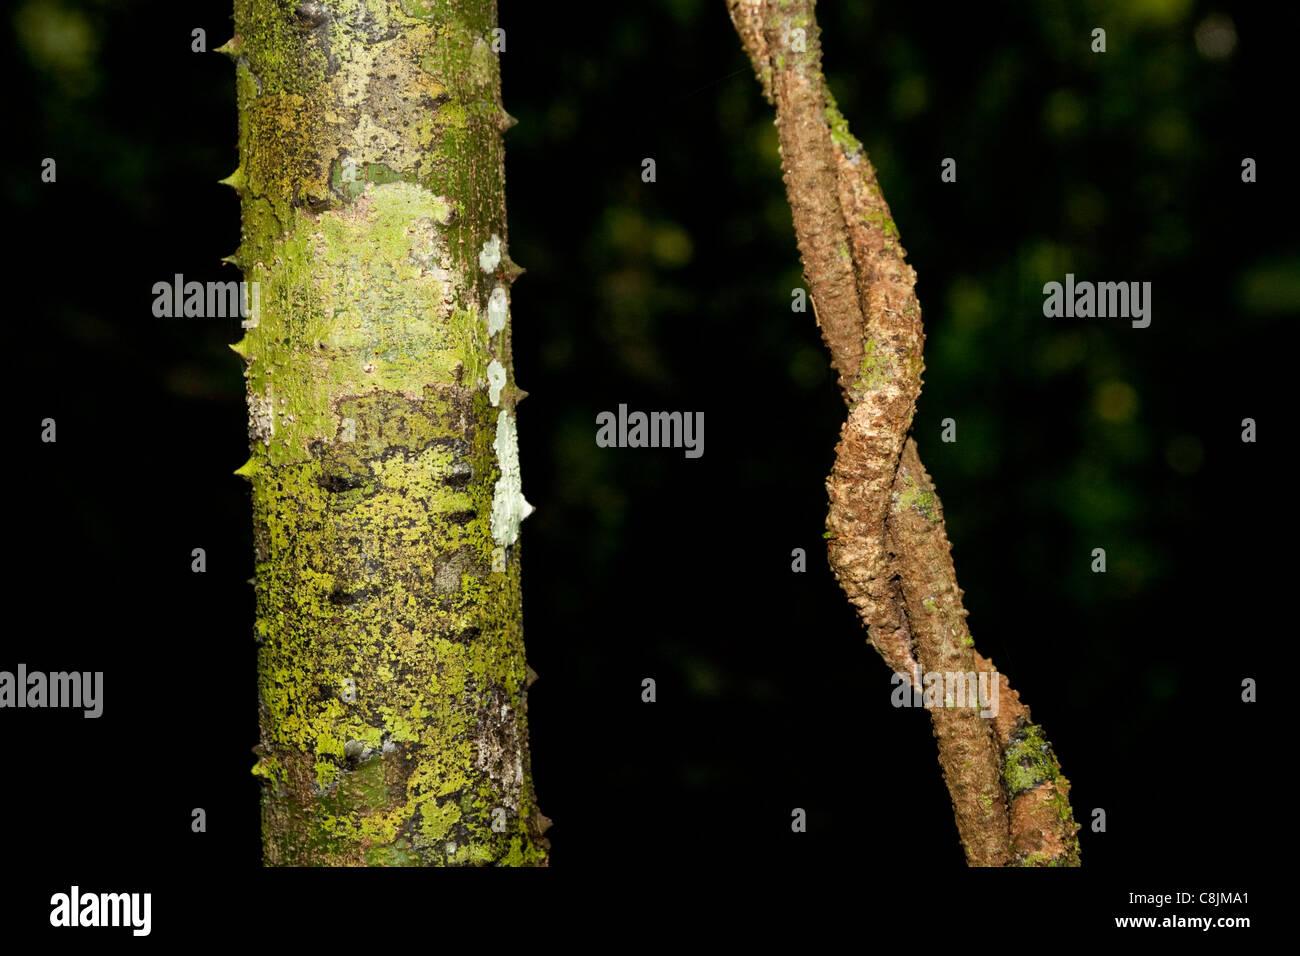 Vines in tropical rainforest, Kinabatangan, Sabah, Borneo, Malaysia - Stock Image